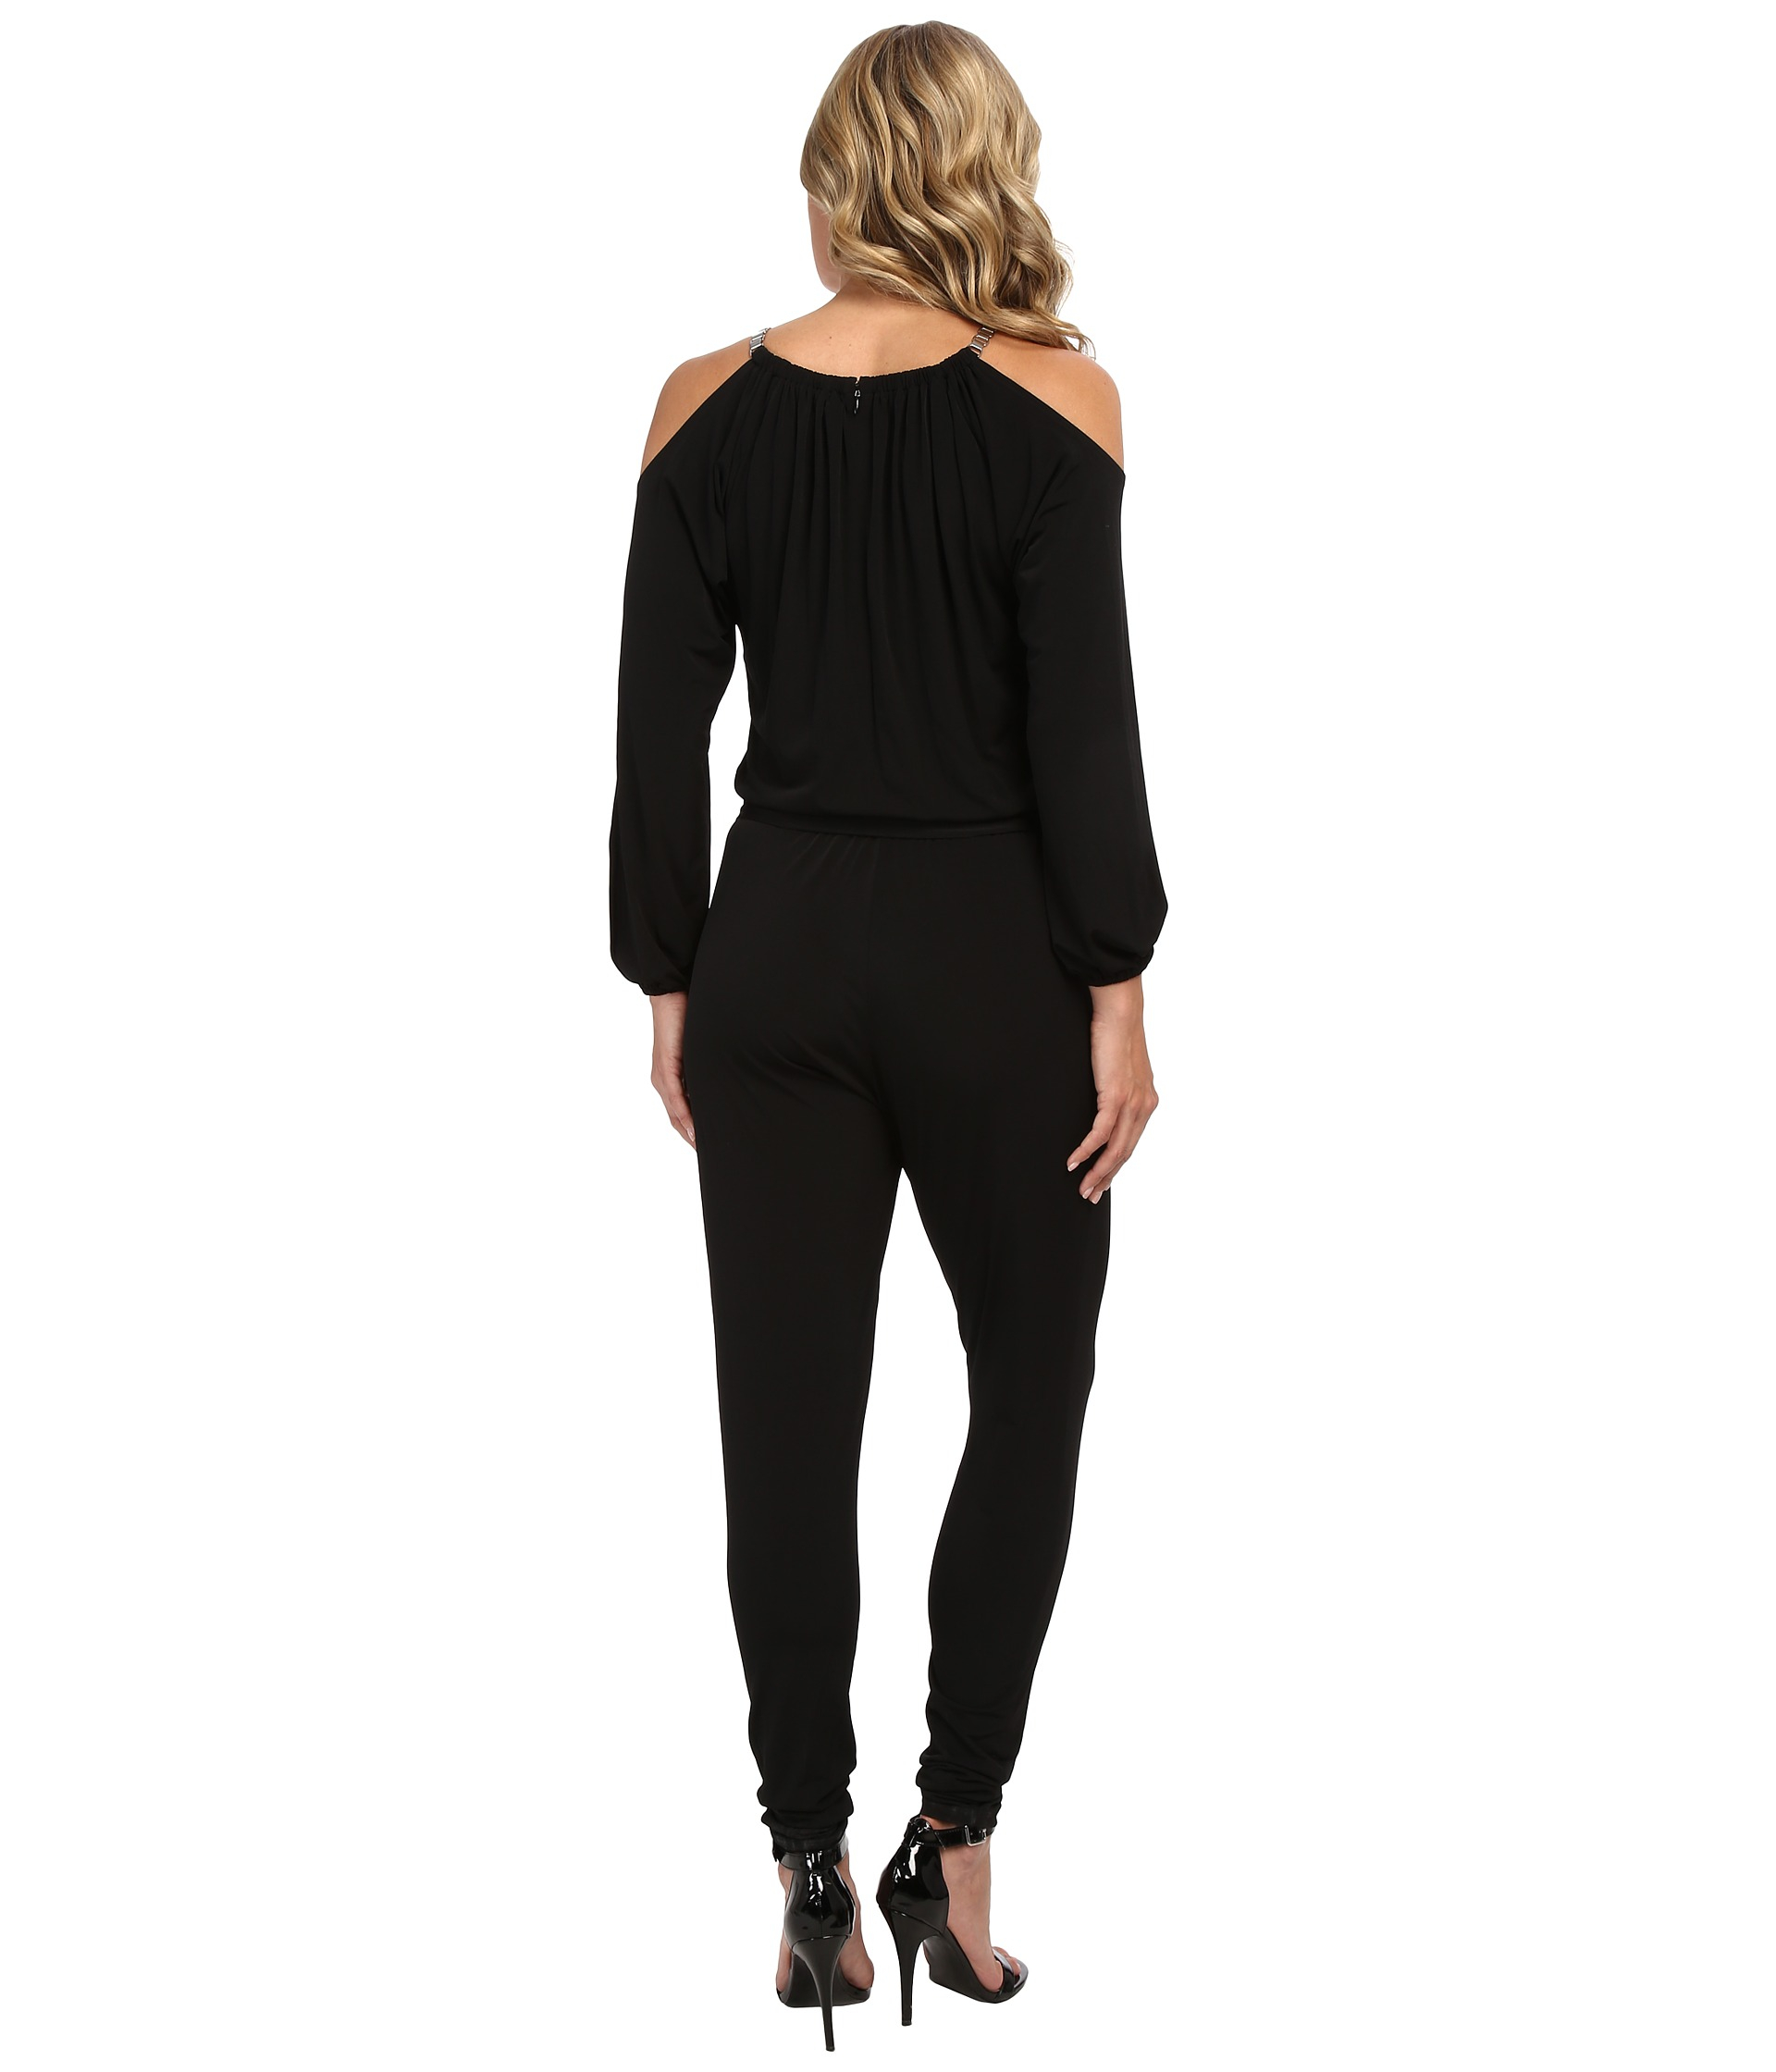 abe0c455dcb Lyst - MICHAEL Michael Kors Chain Strap Jumpsuit in Black